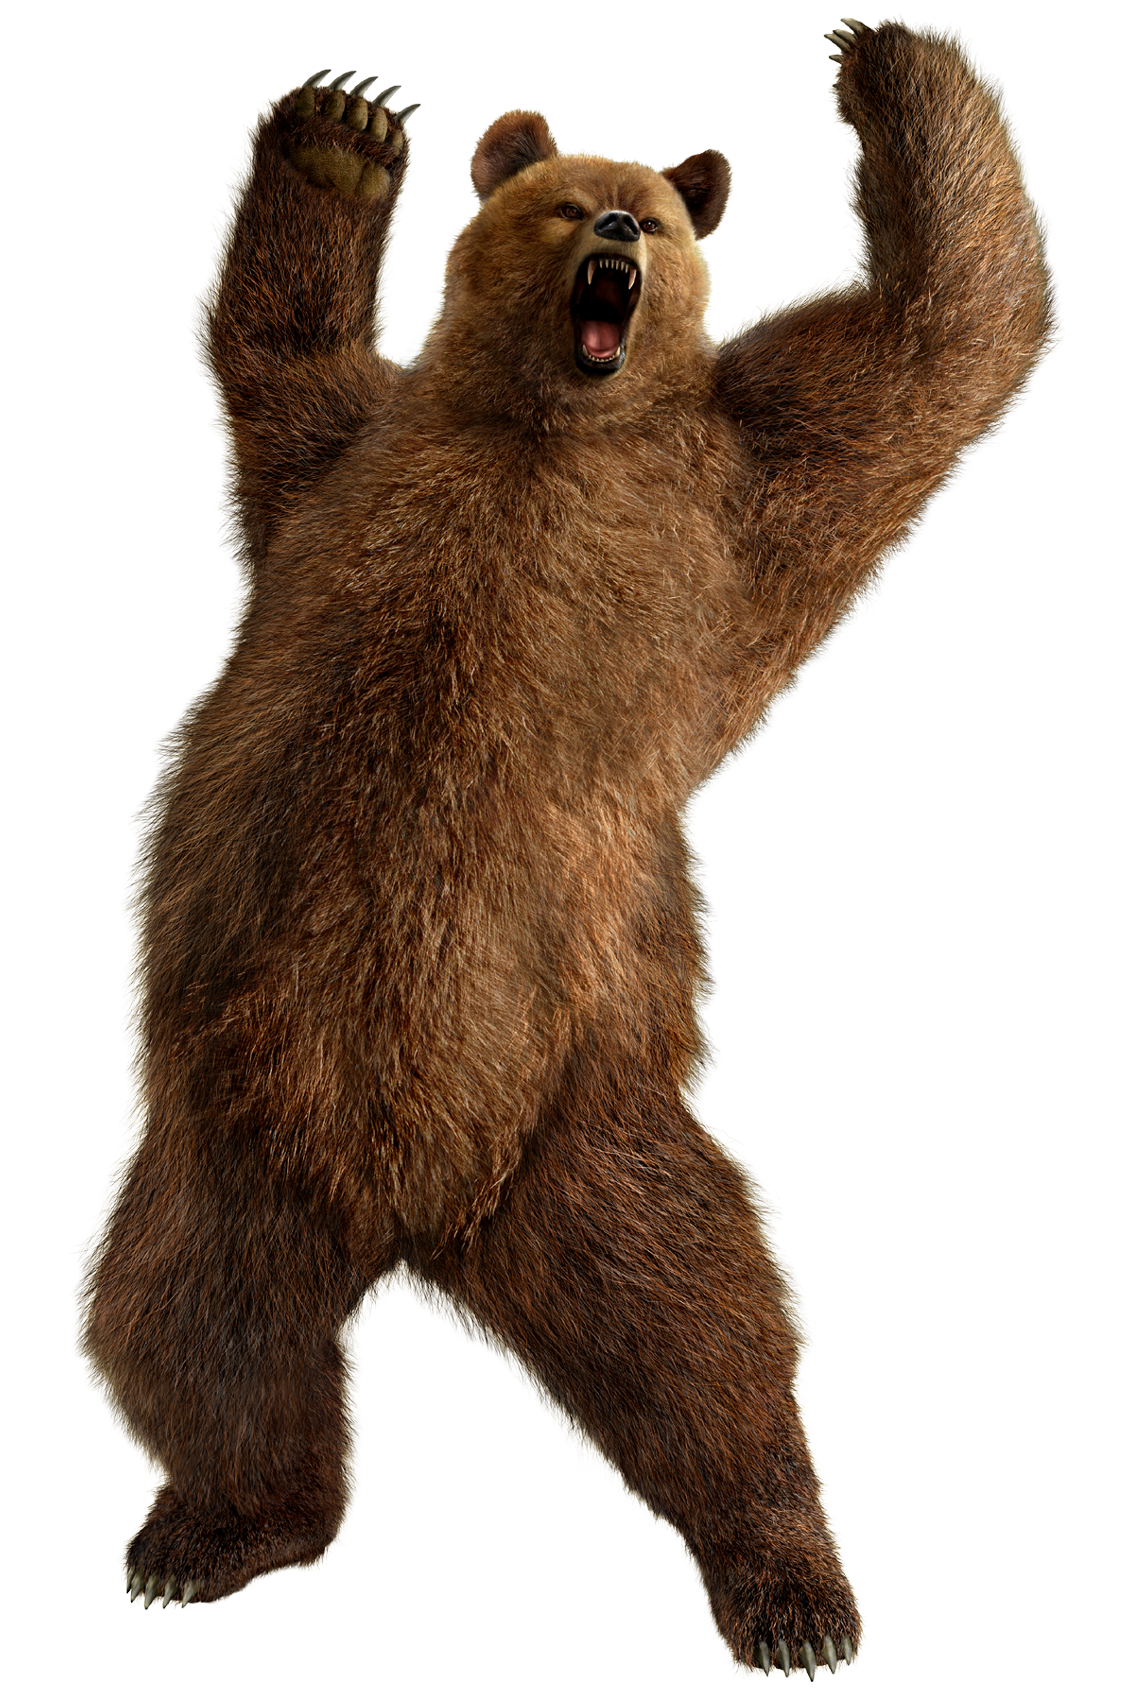 Furry clipart big bear #11